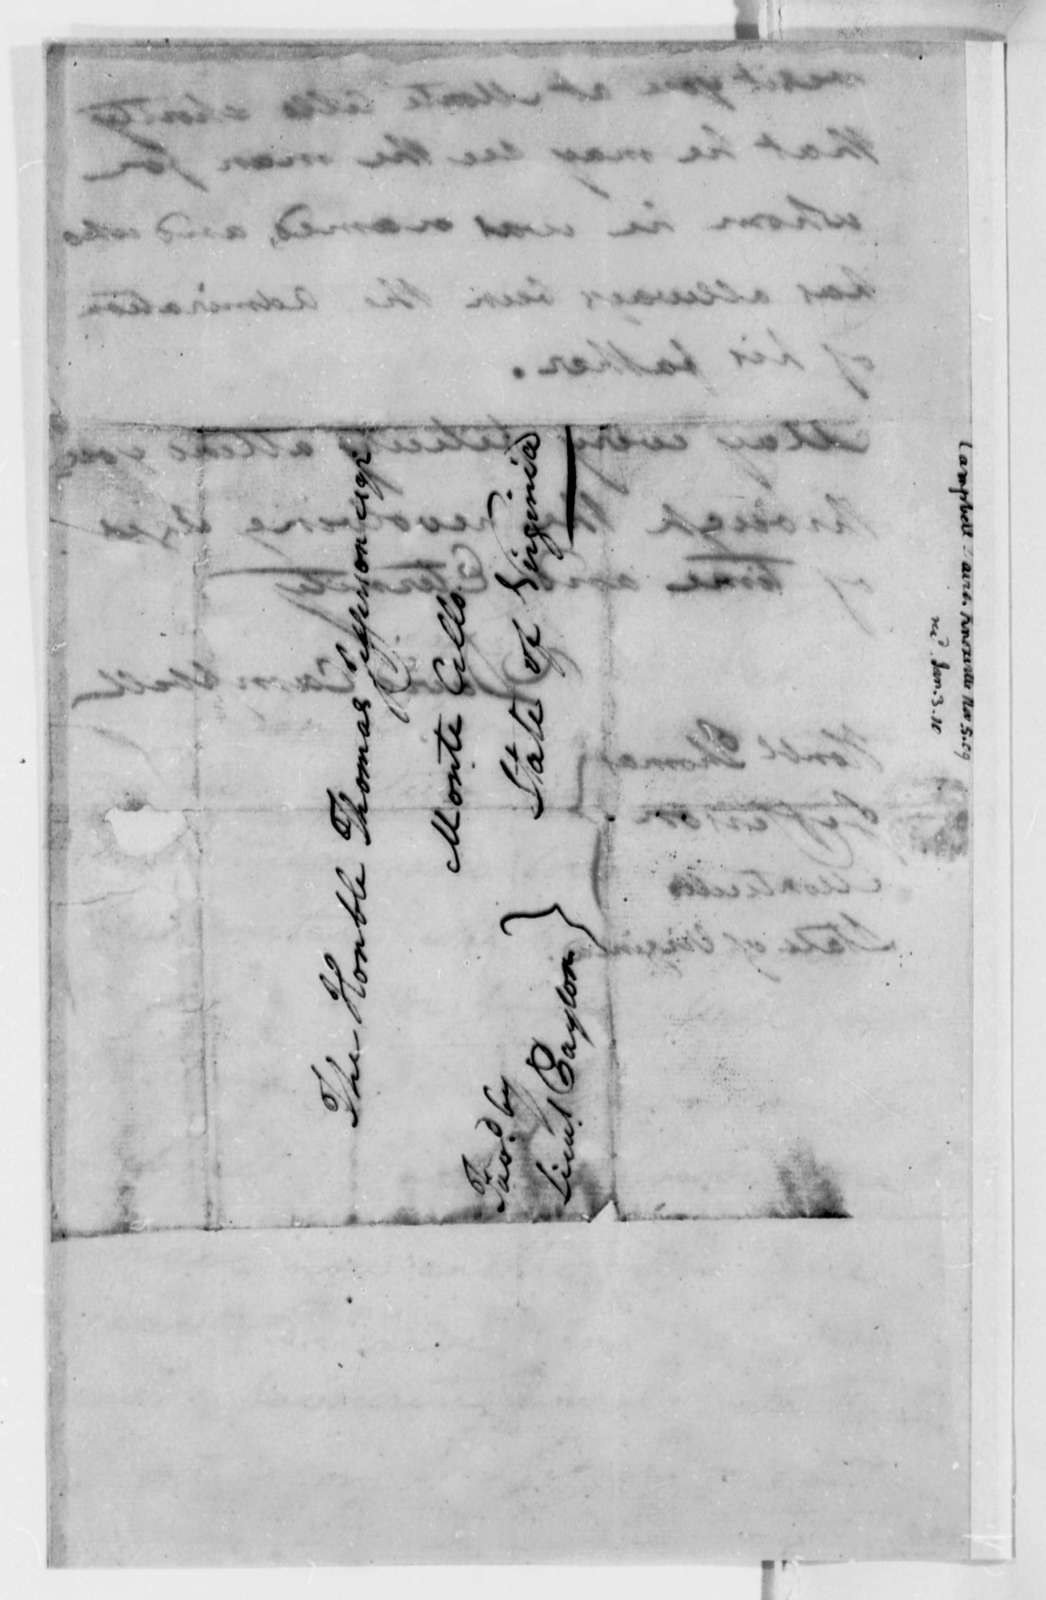 David Campbell to Thomas Jefferson, November 5, 1809